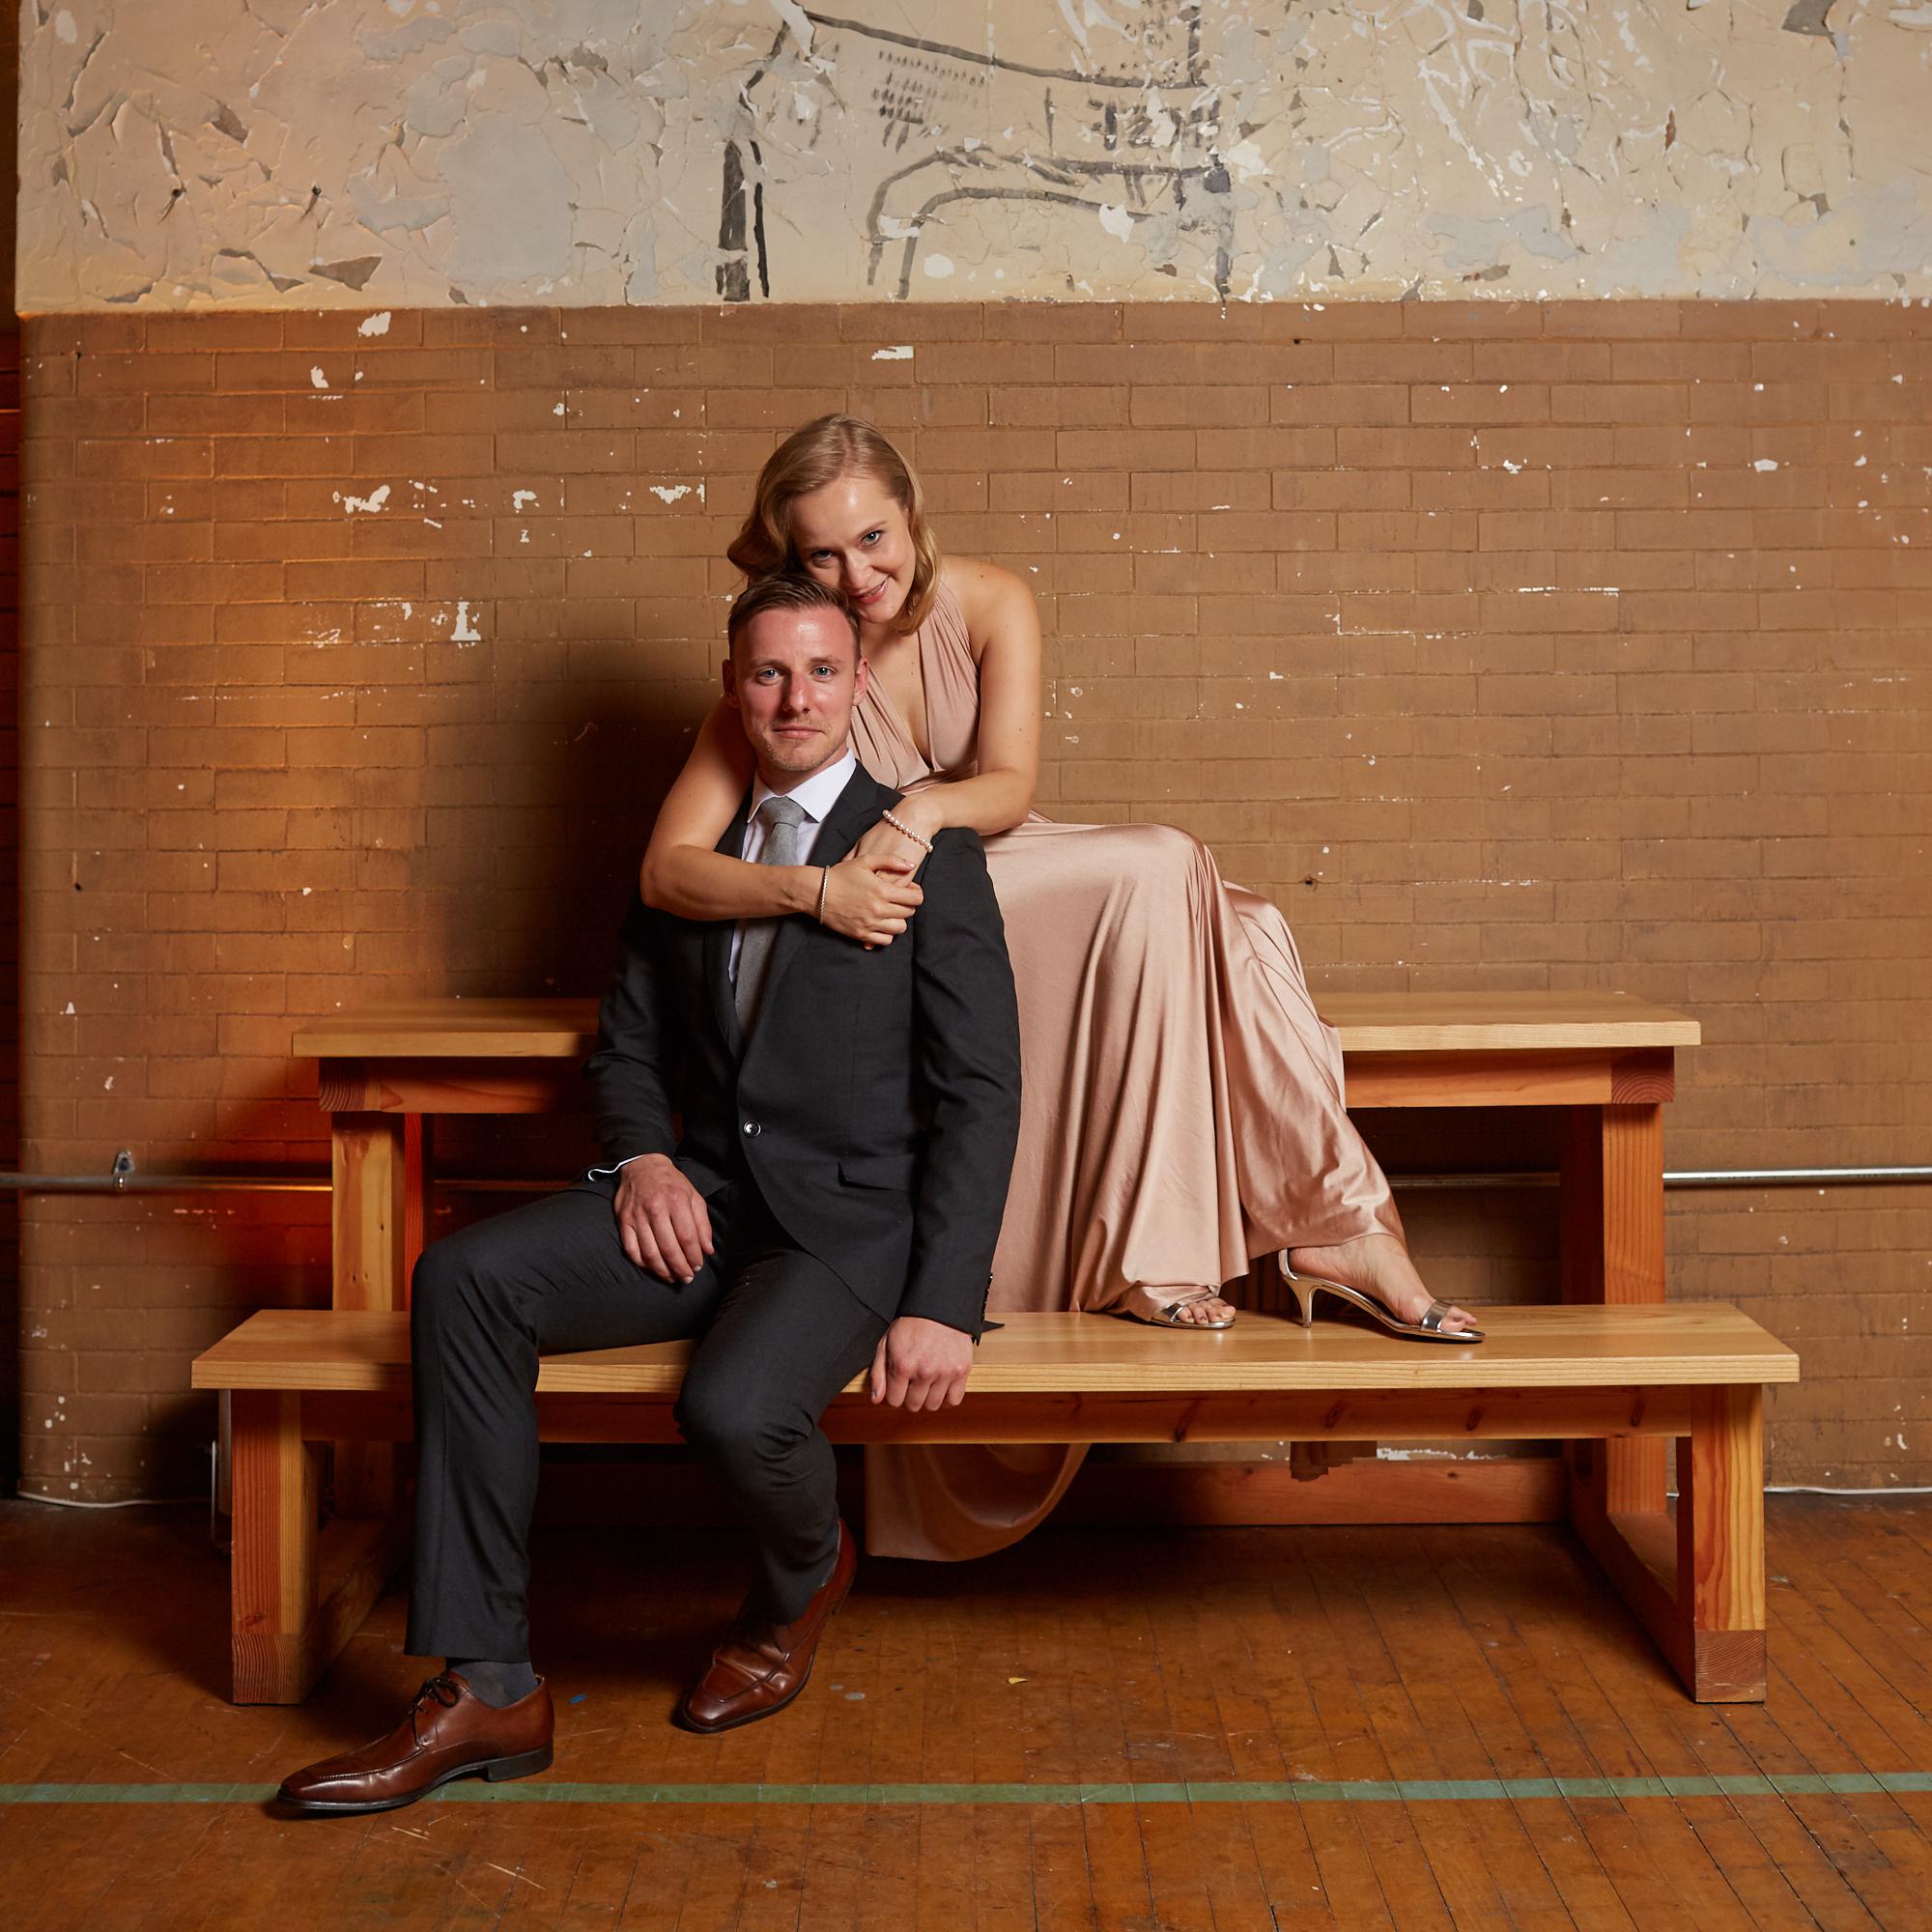 Ryan Hannah Sims - 2017.09 - Wedding Photos - 967.jpg